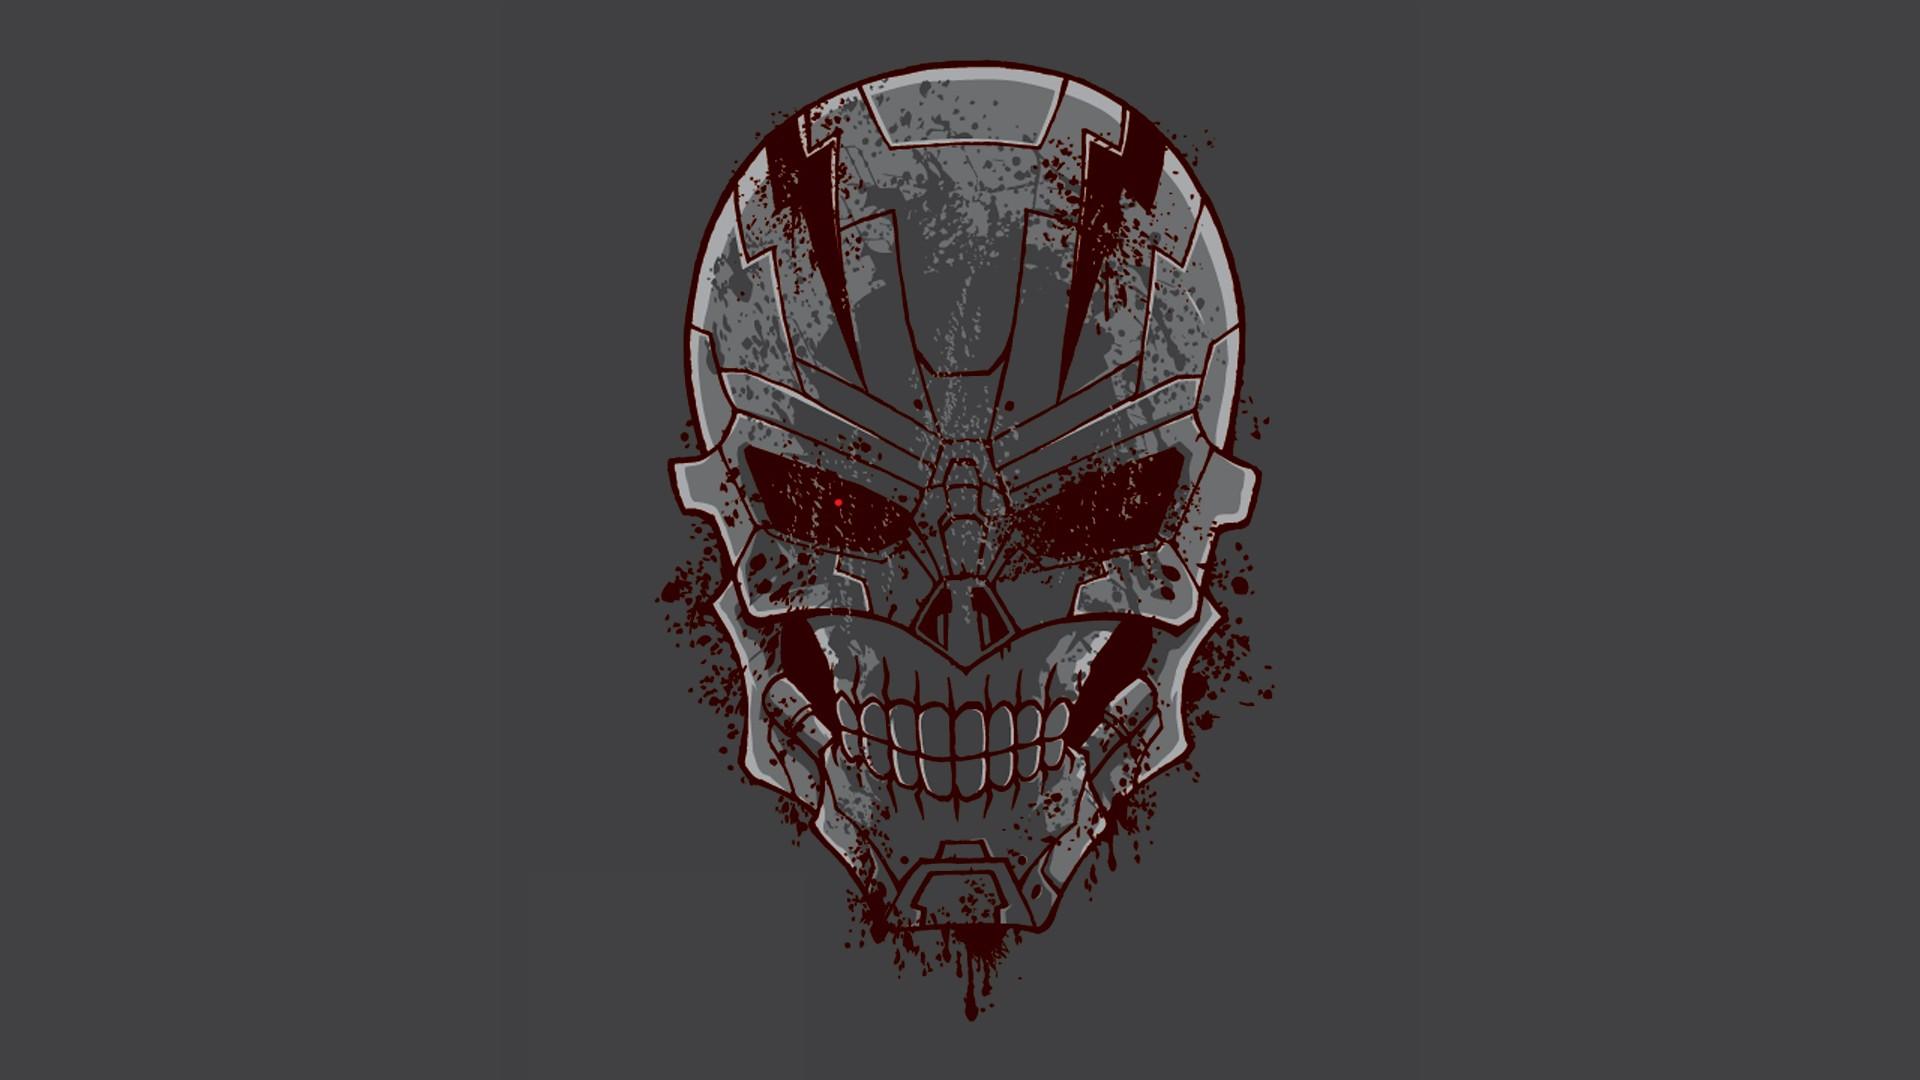 Fonds Dcran Terminator - MaximumWallHD